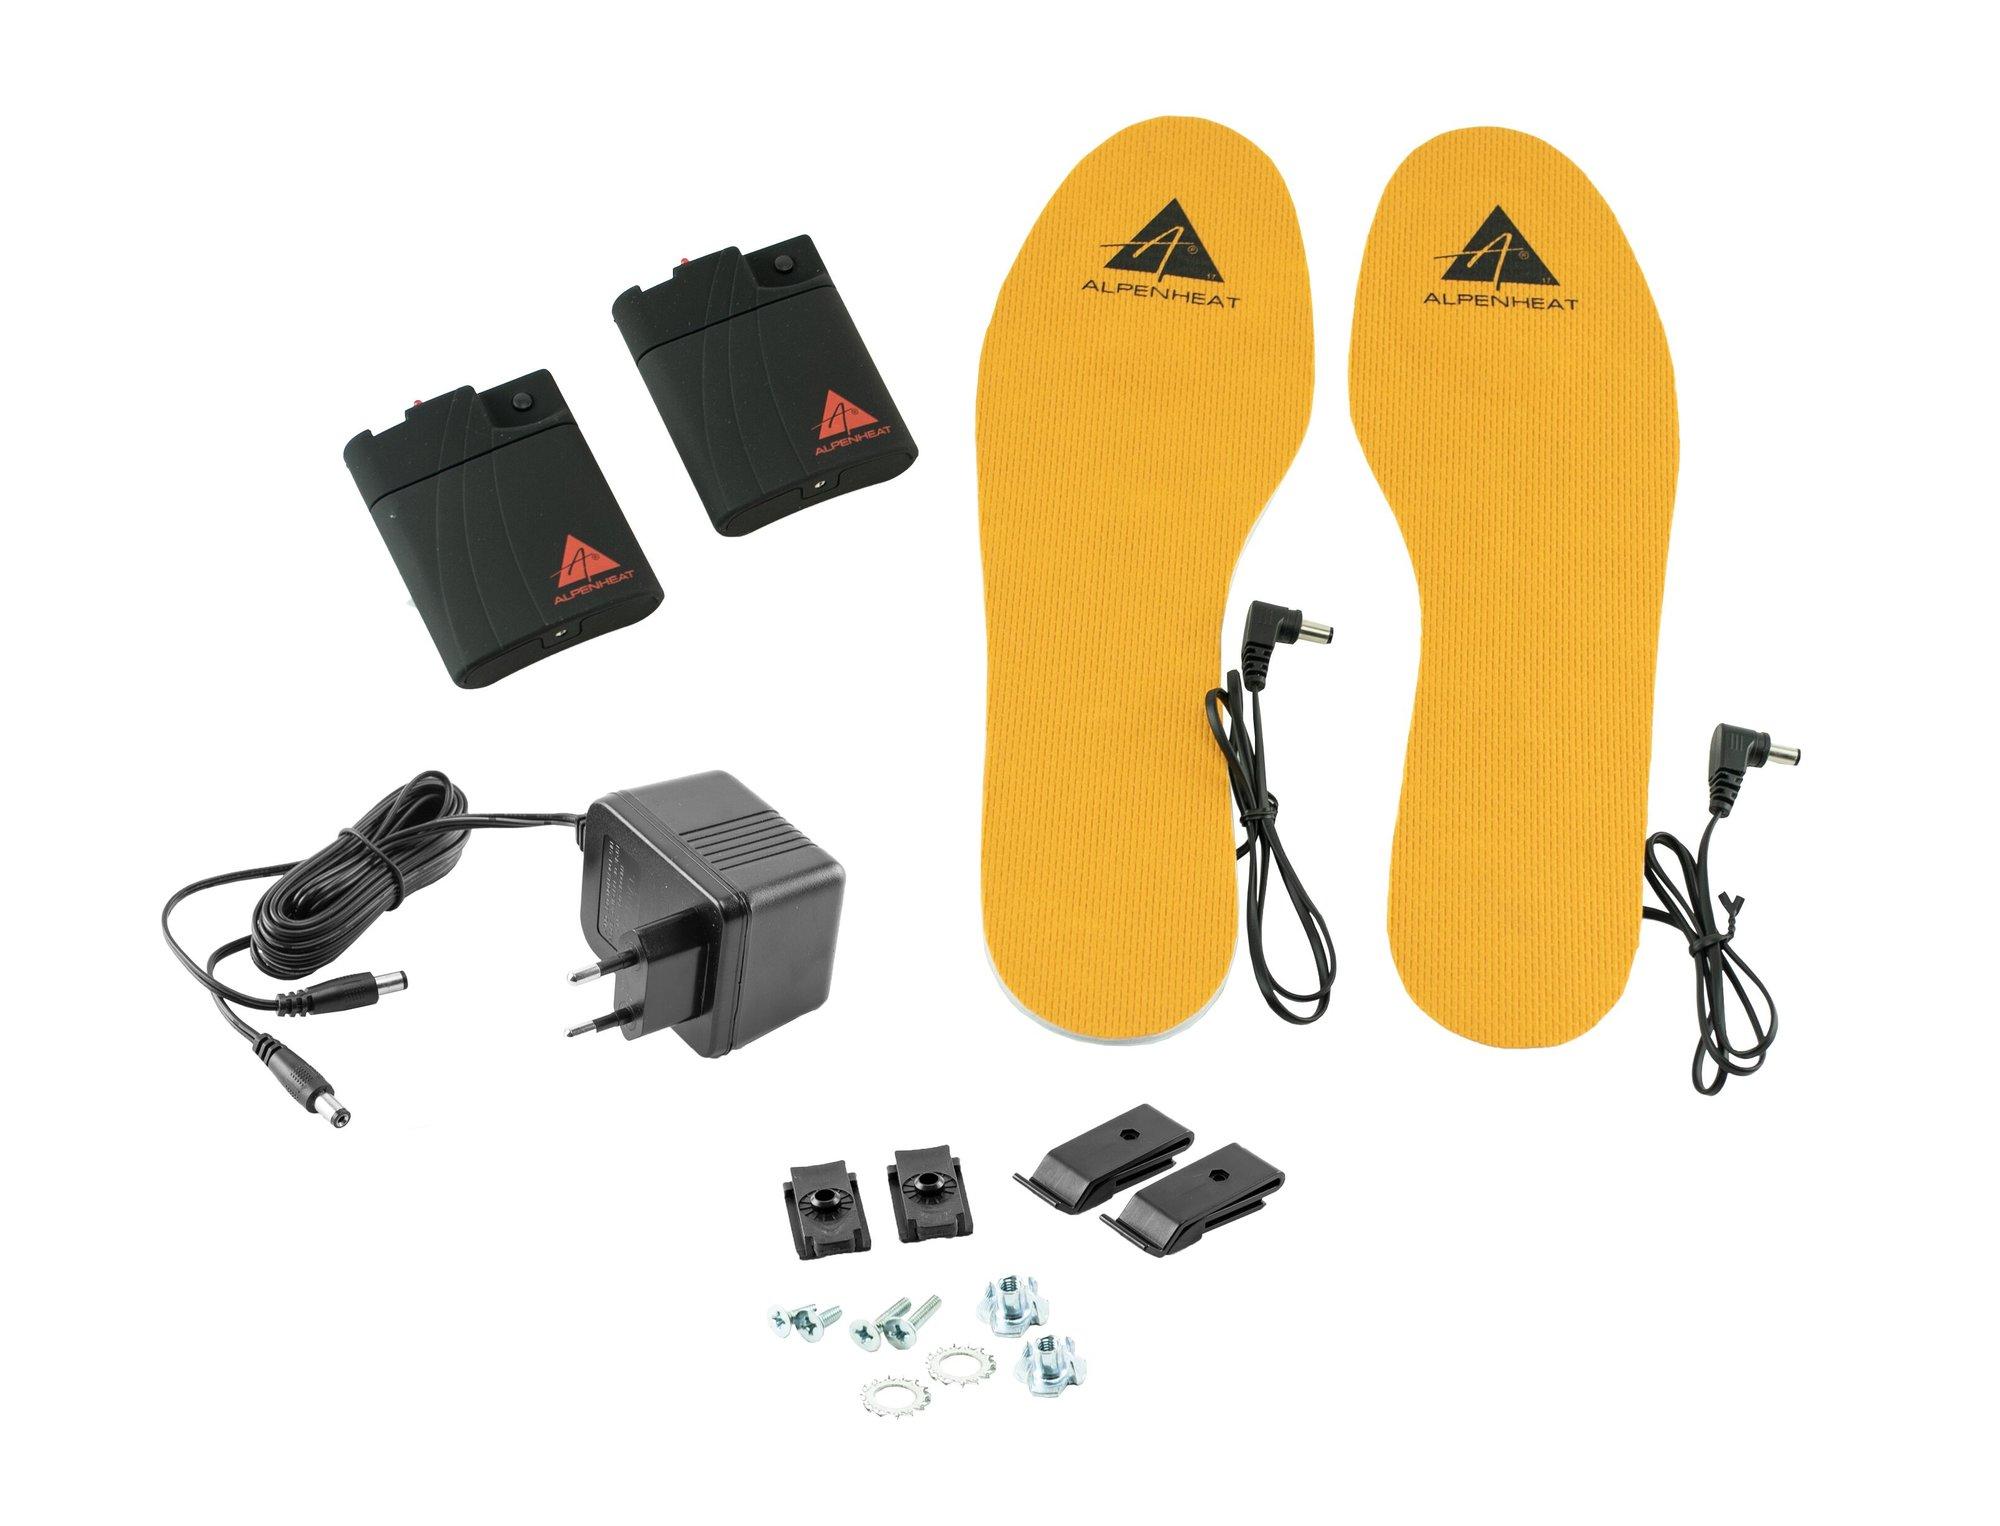 Vyhrievané vložky do topánok Alpenheat AH8 Comfort